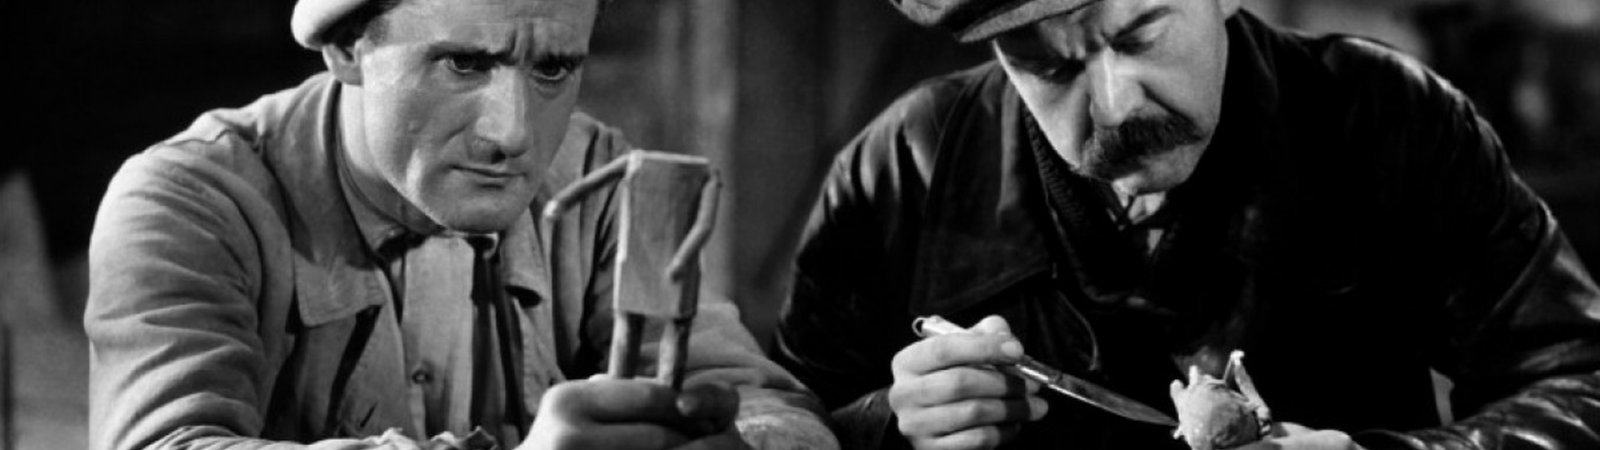 Photo dernier film Fernand Ledoux